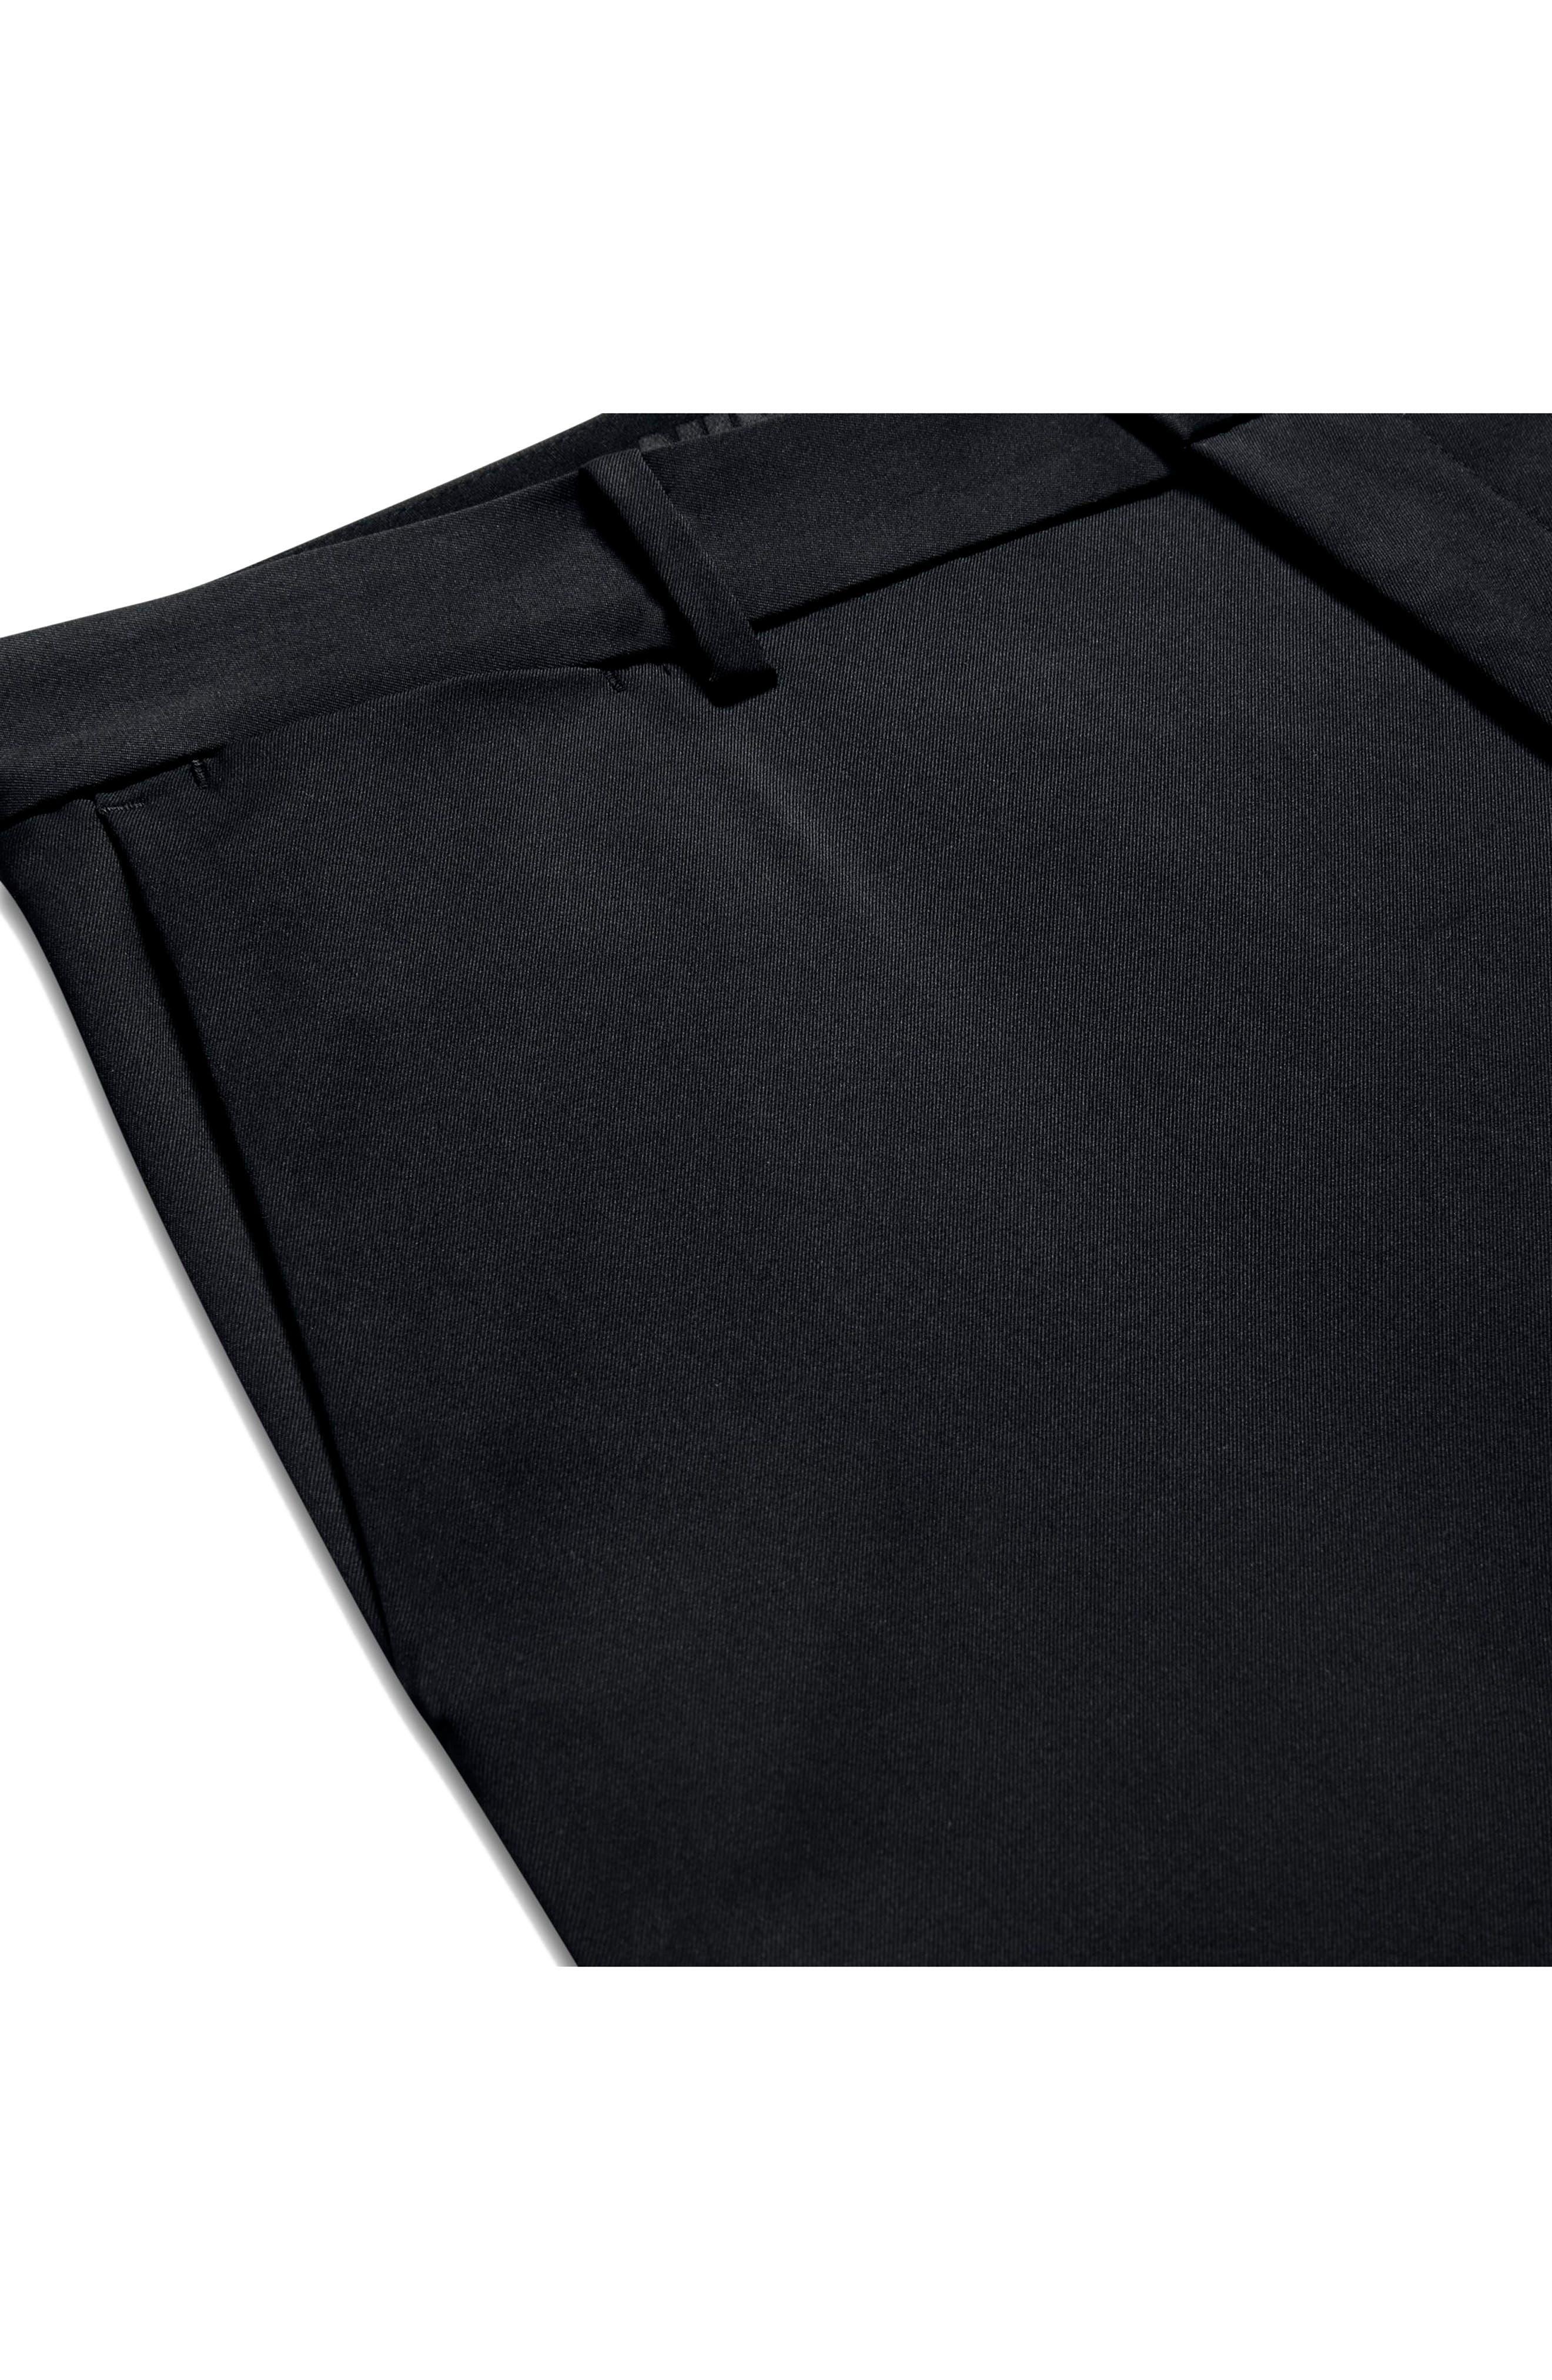 Flat Front Golf Shorts,                             Alternate thumbnail 60, color,